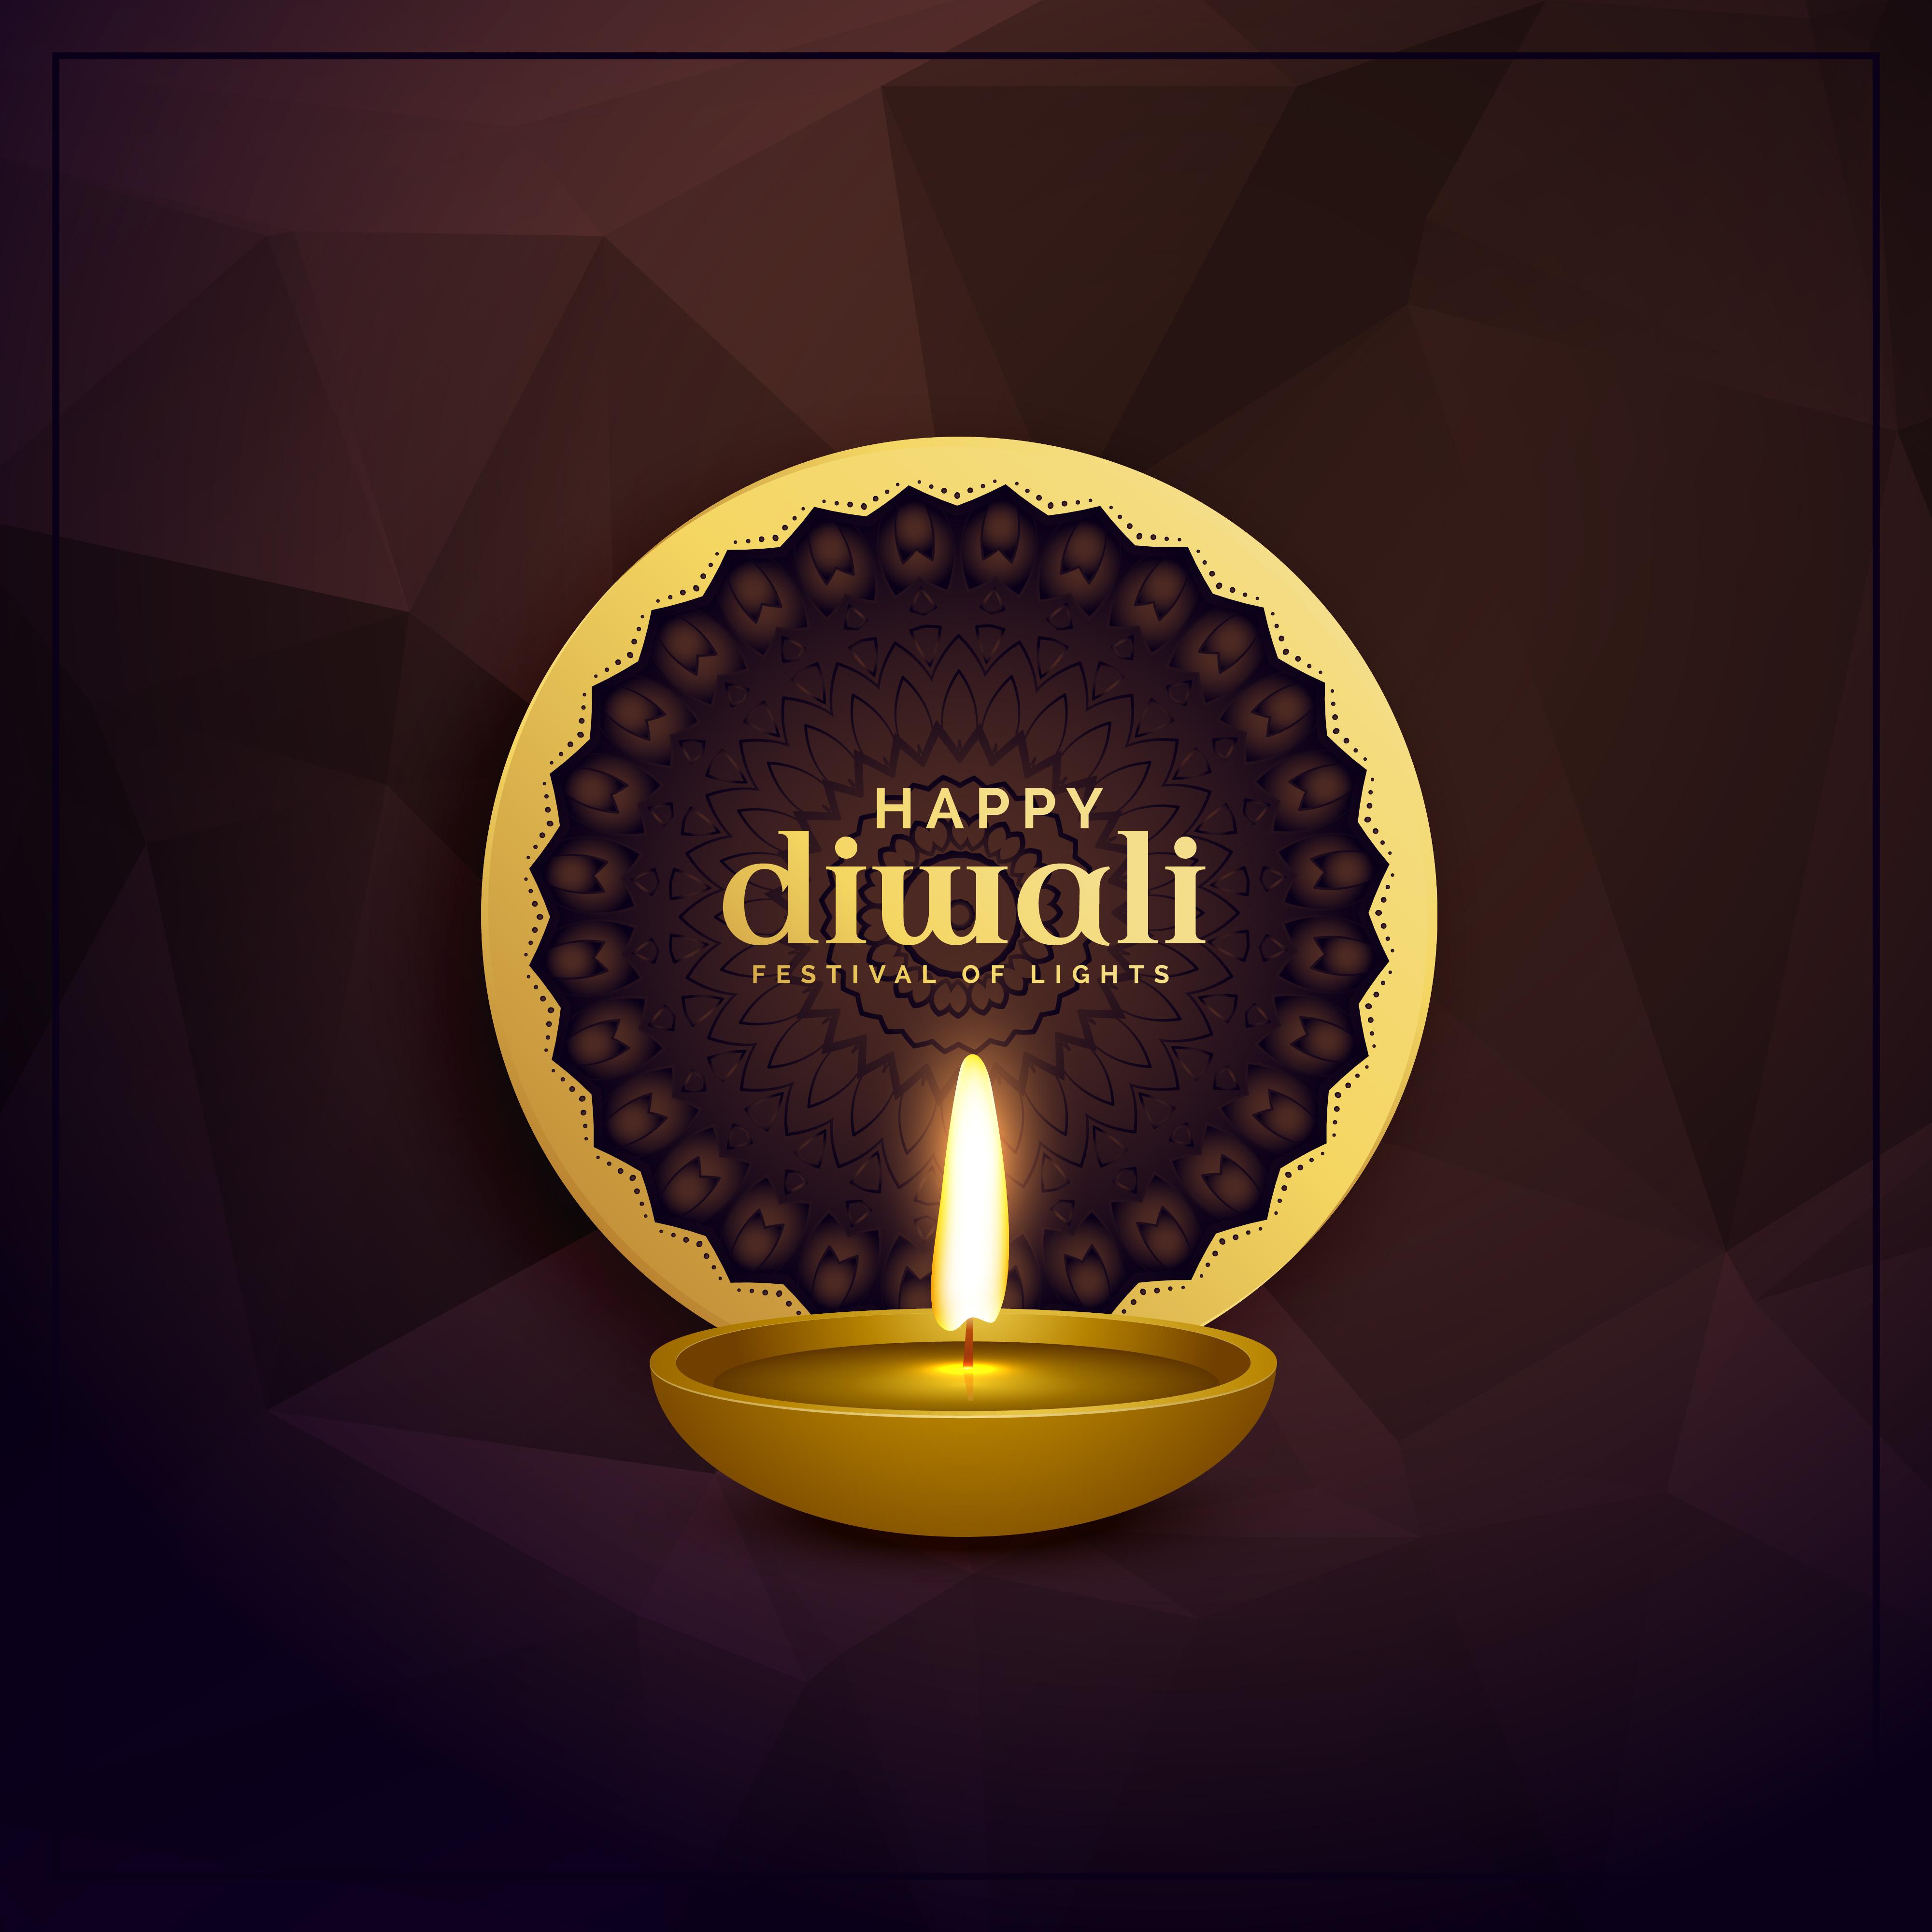 Golden Diwali Greeting Card Design With Diya Lamp Download Free